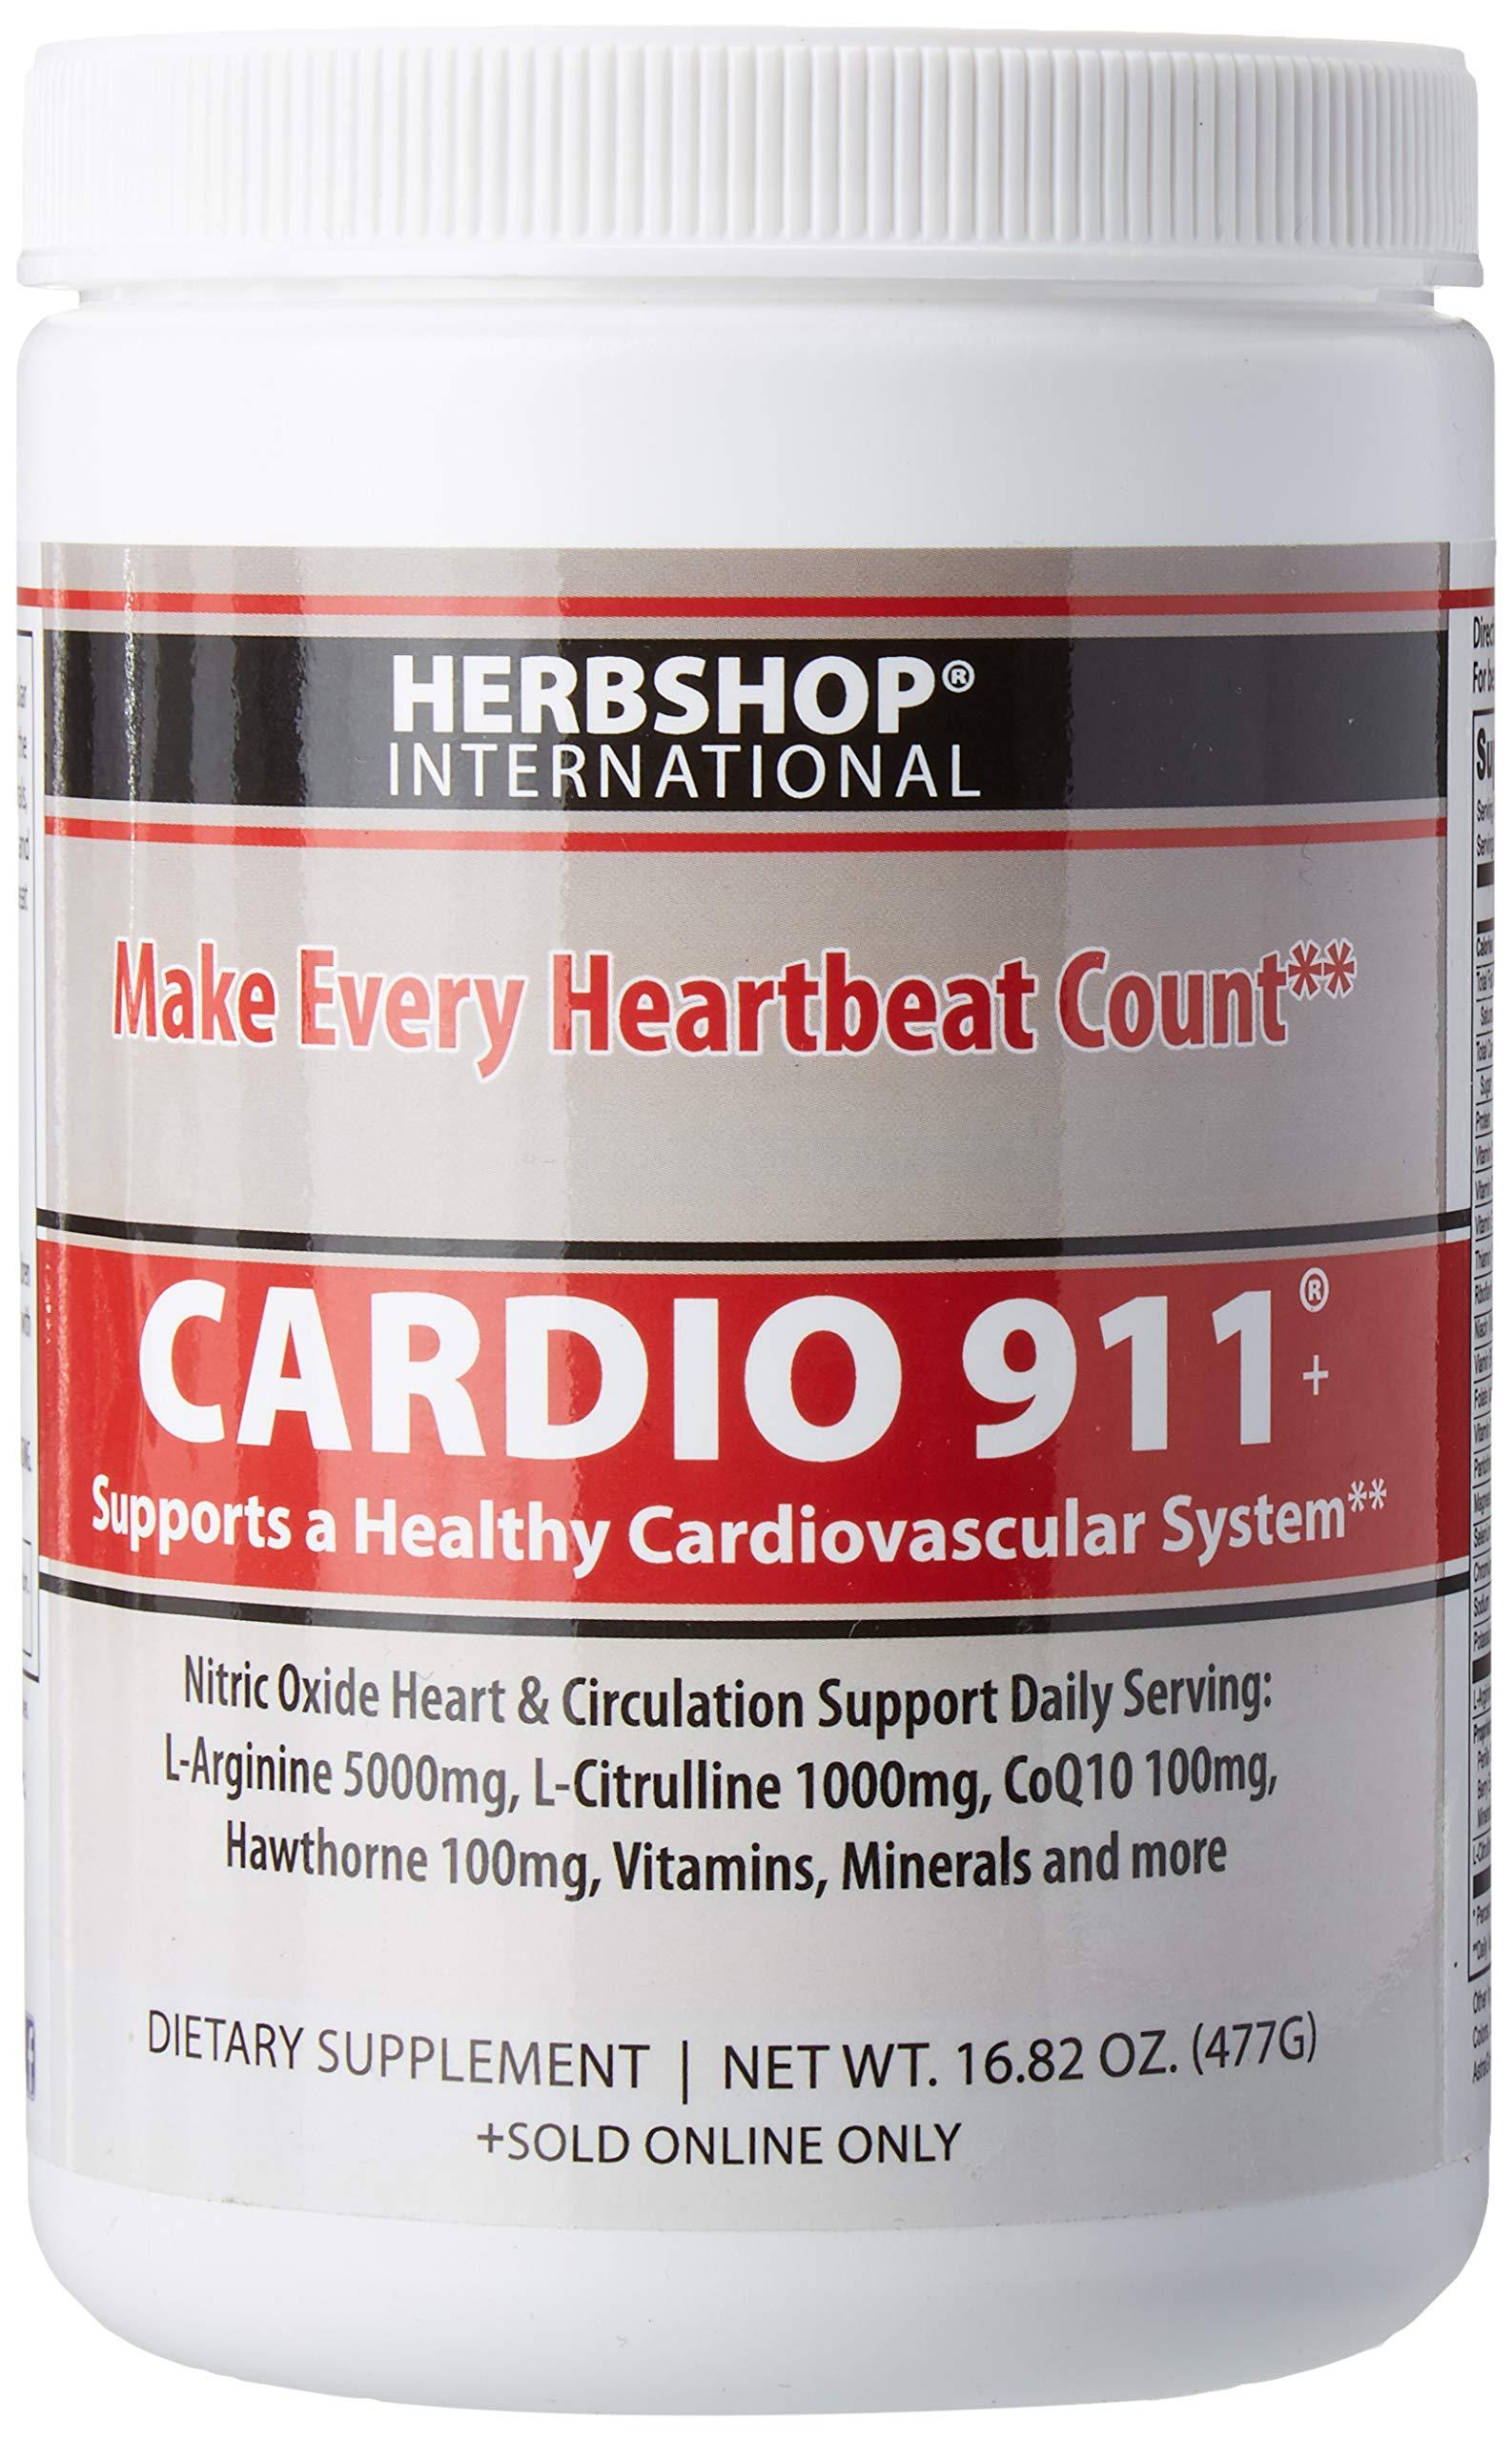 Cardio 911® Heart Health Nitric Oxide (16.82 Ounce Powder with Scoop) Tart Cherry Flavor L-Arginine Supplement 5000mg + L-Citrulline 1000mg,16.82 Ounces by Cardio 911